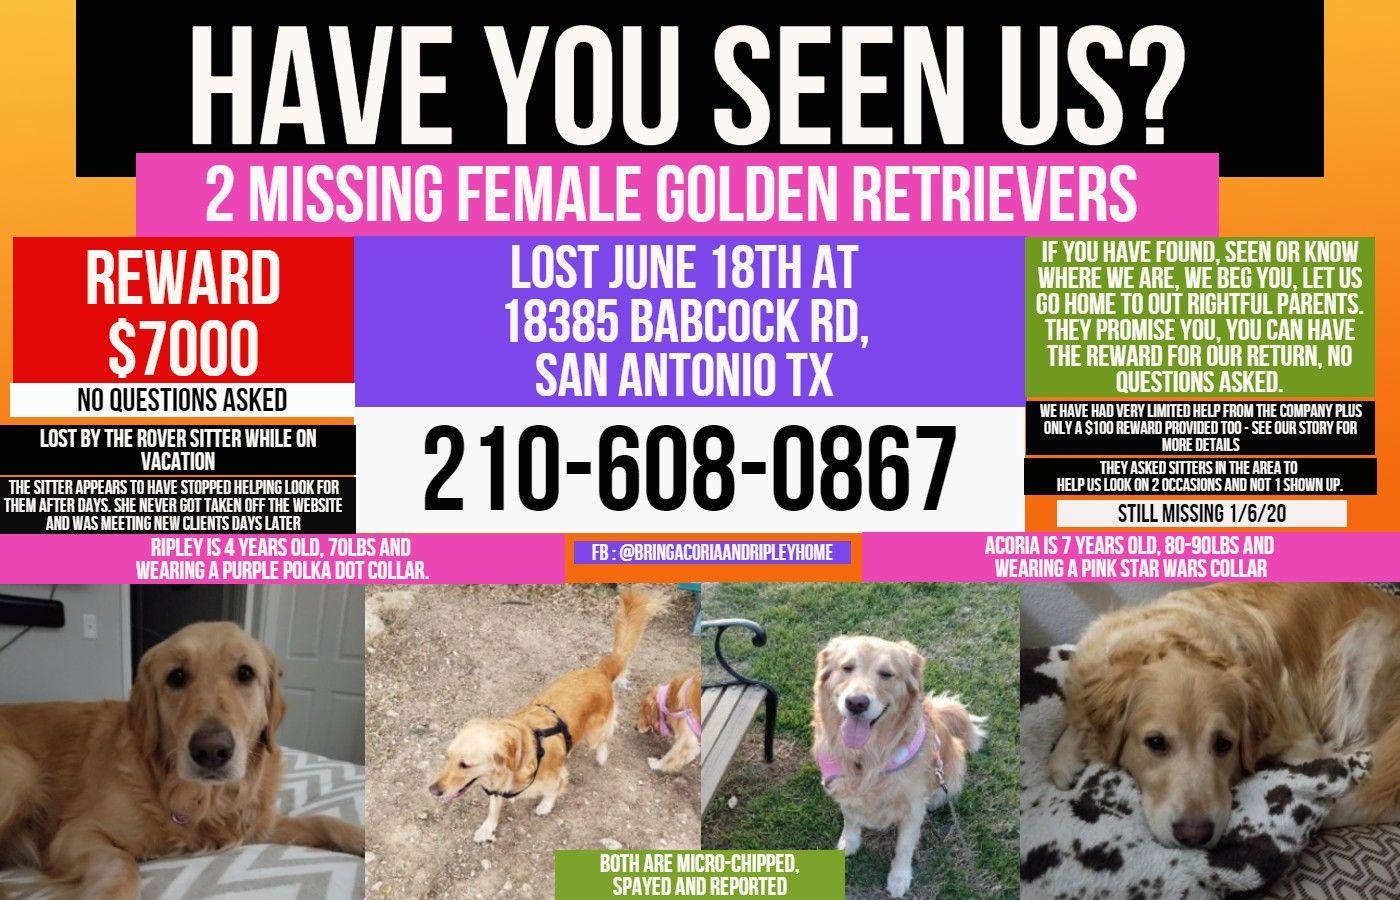 7k Reward For The Return Of Our 2 Missing Female Golden